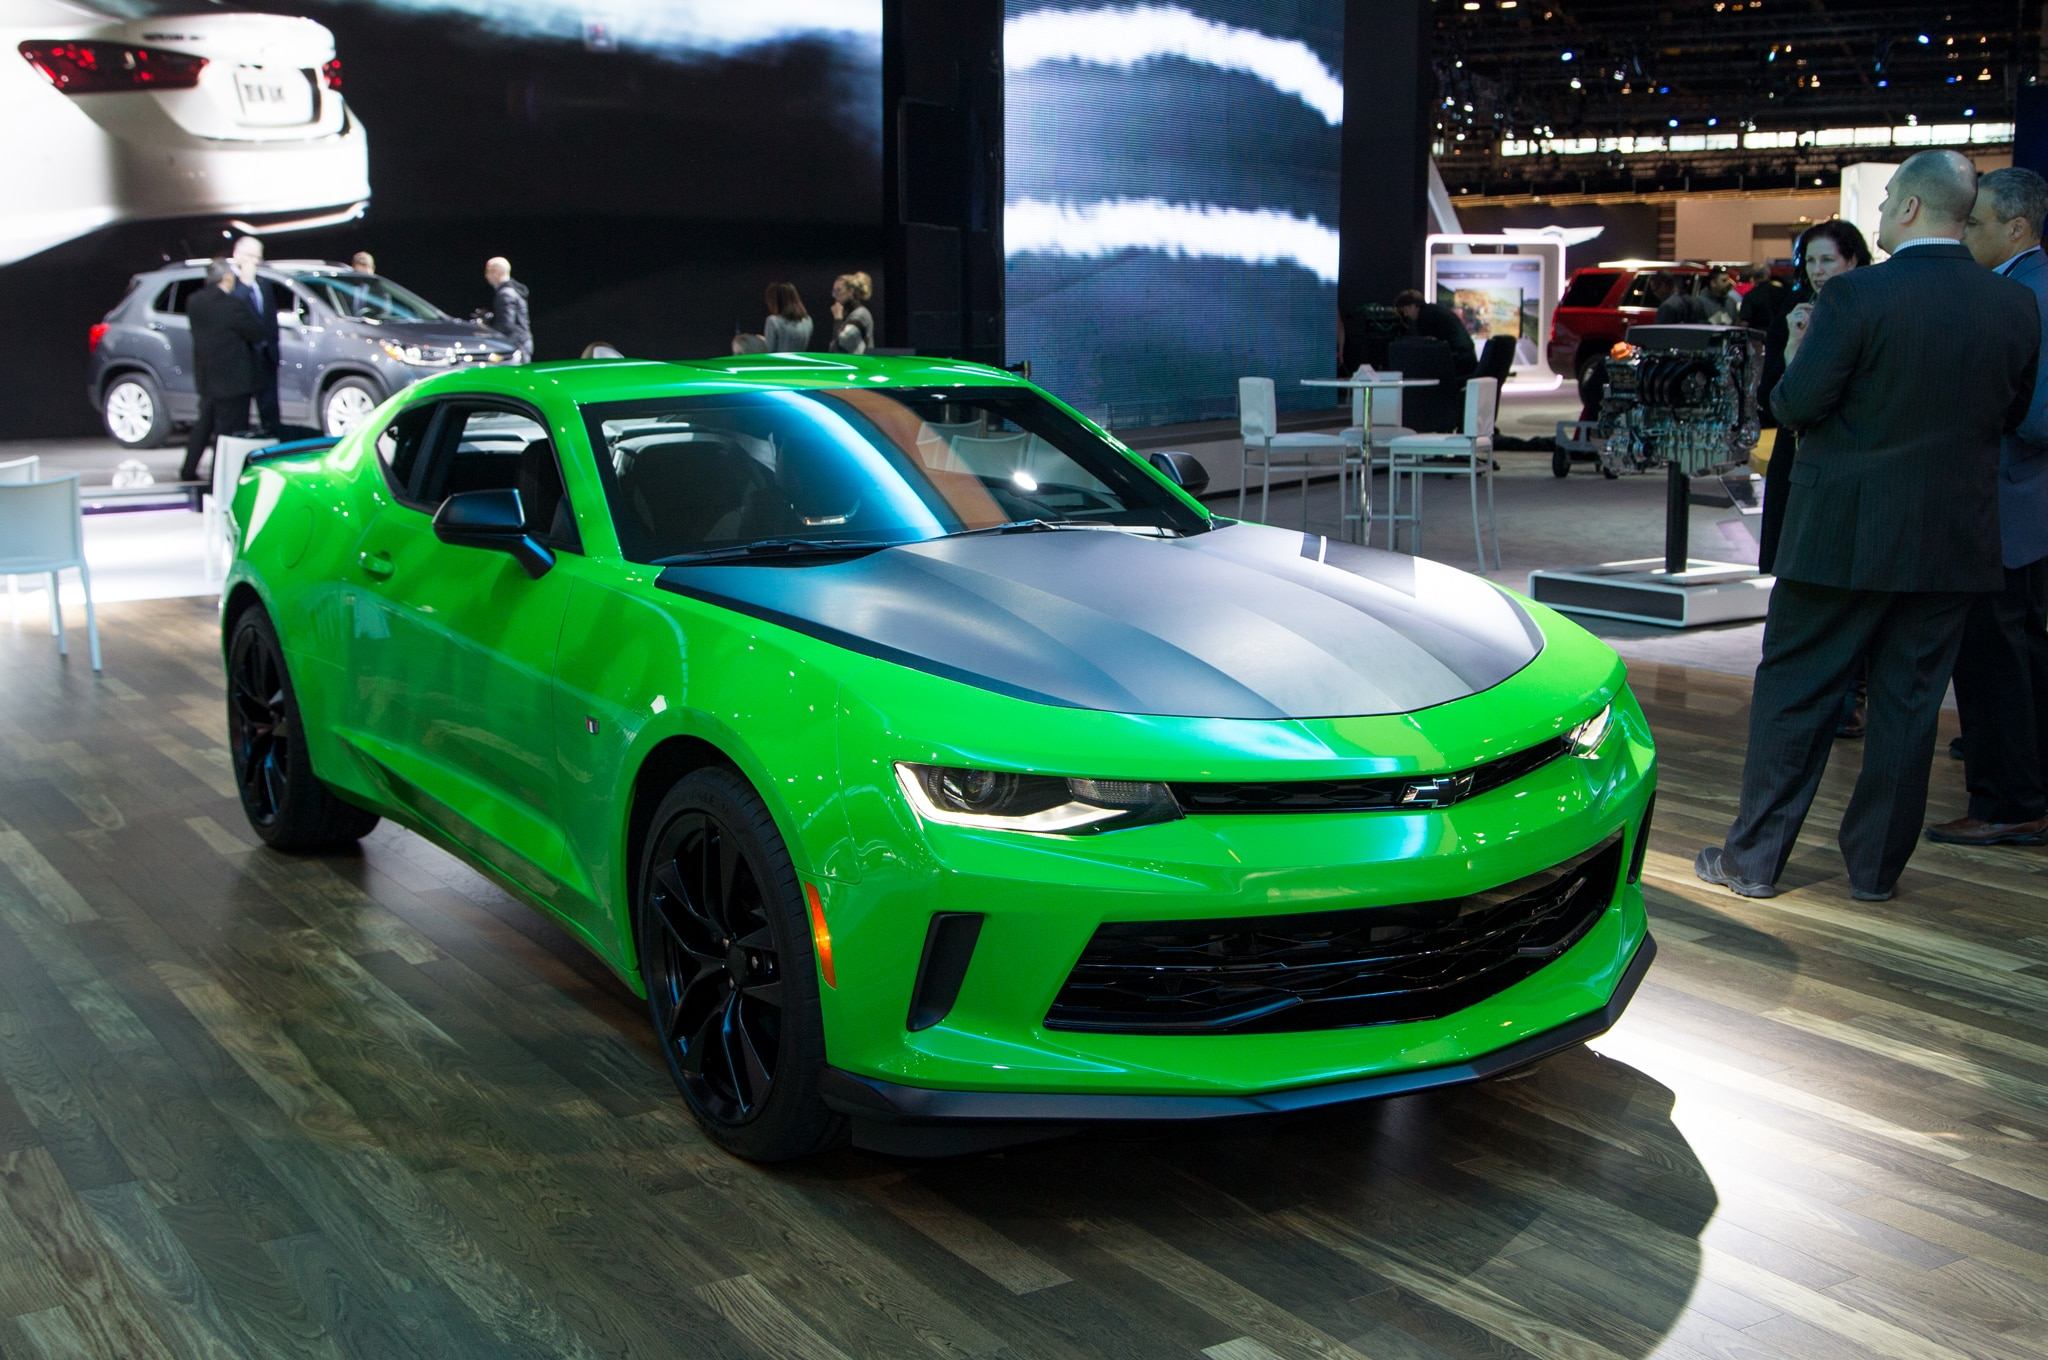 2017 Chevrolet Camaro SS 1LE New V6 1LE Revealed for Chicago Show